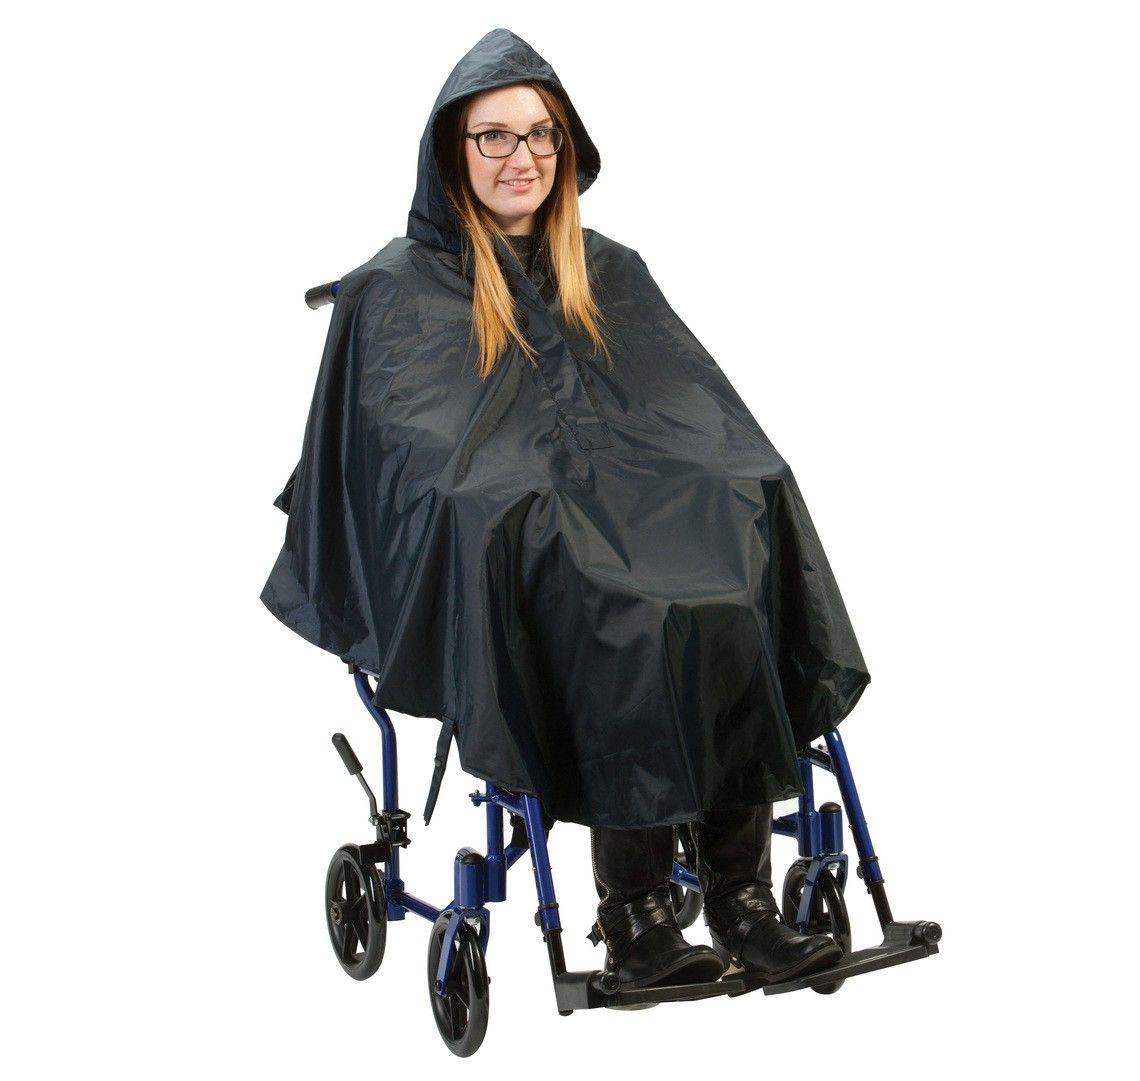 Lady wearing the black nylon wheelchair poncho